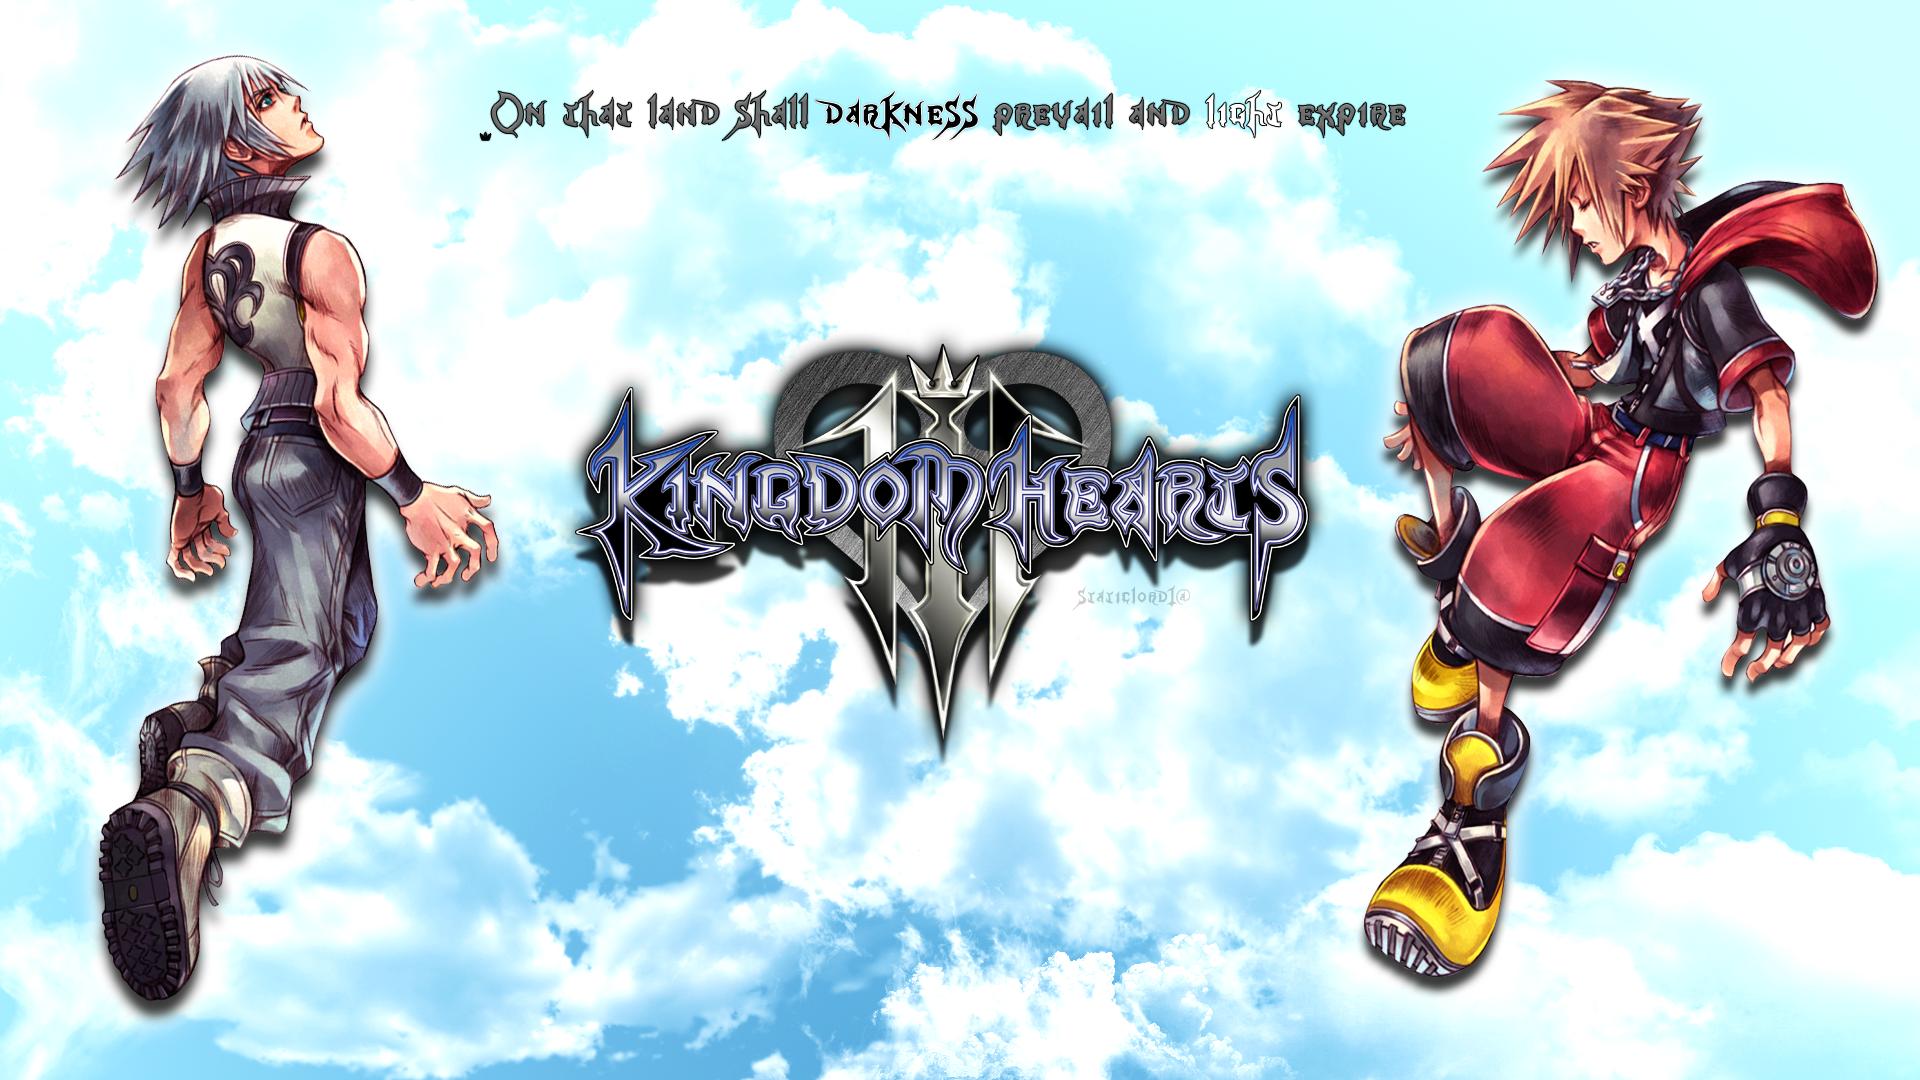 Kingdom Hearts 3 Sora Riku Wallpaper By Static989 On Deviantart